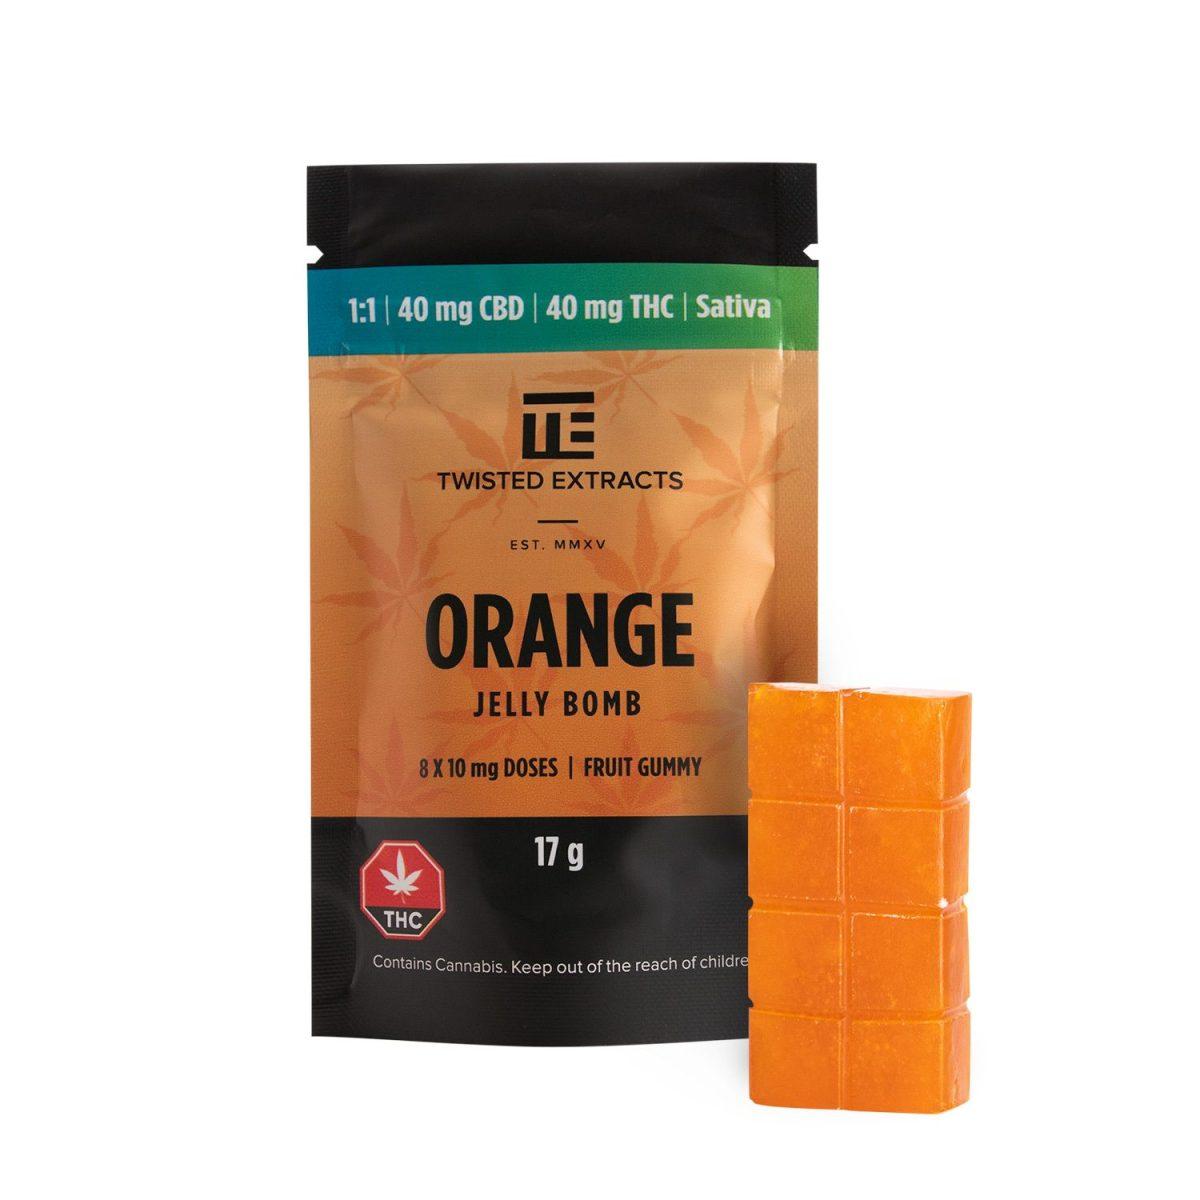 Twisted Orange 1 1 MMJ